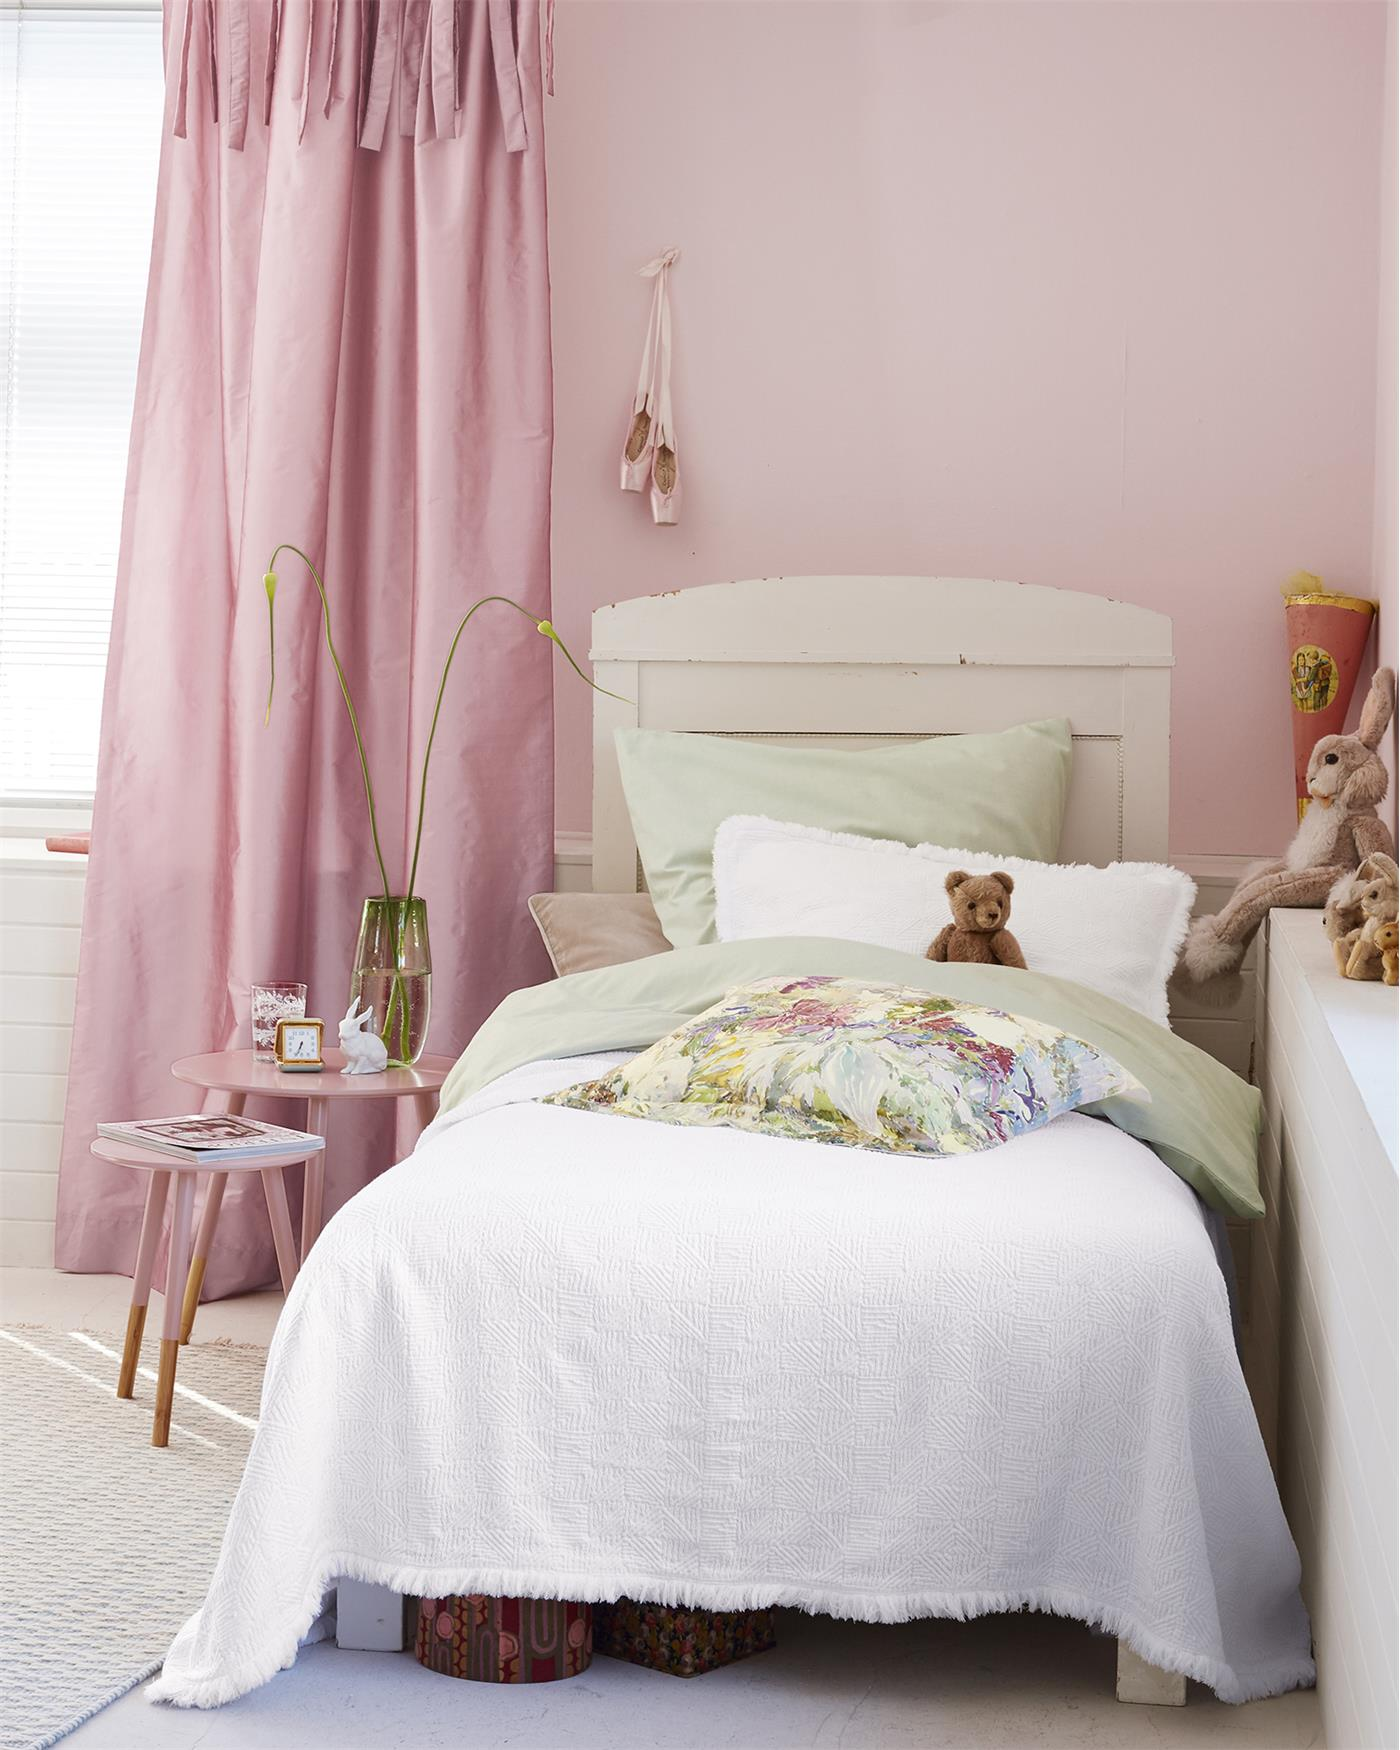 piqu decke mit fransen. Black Bedroom Furniture Sets. Home Design Ideas